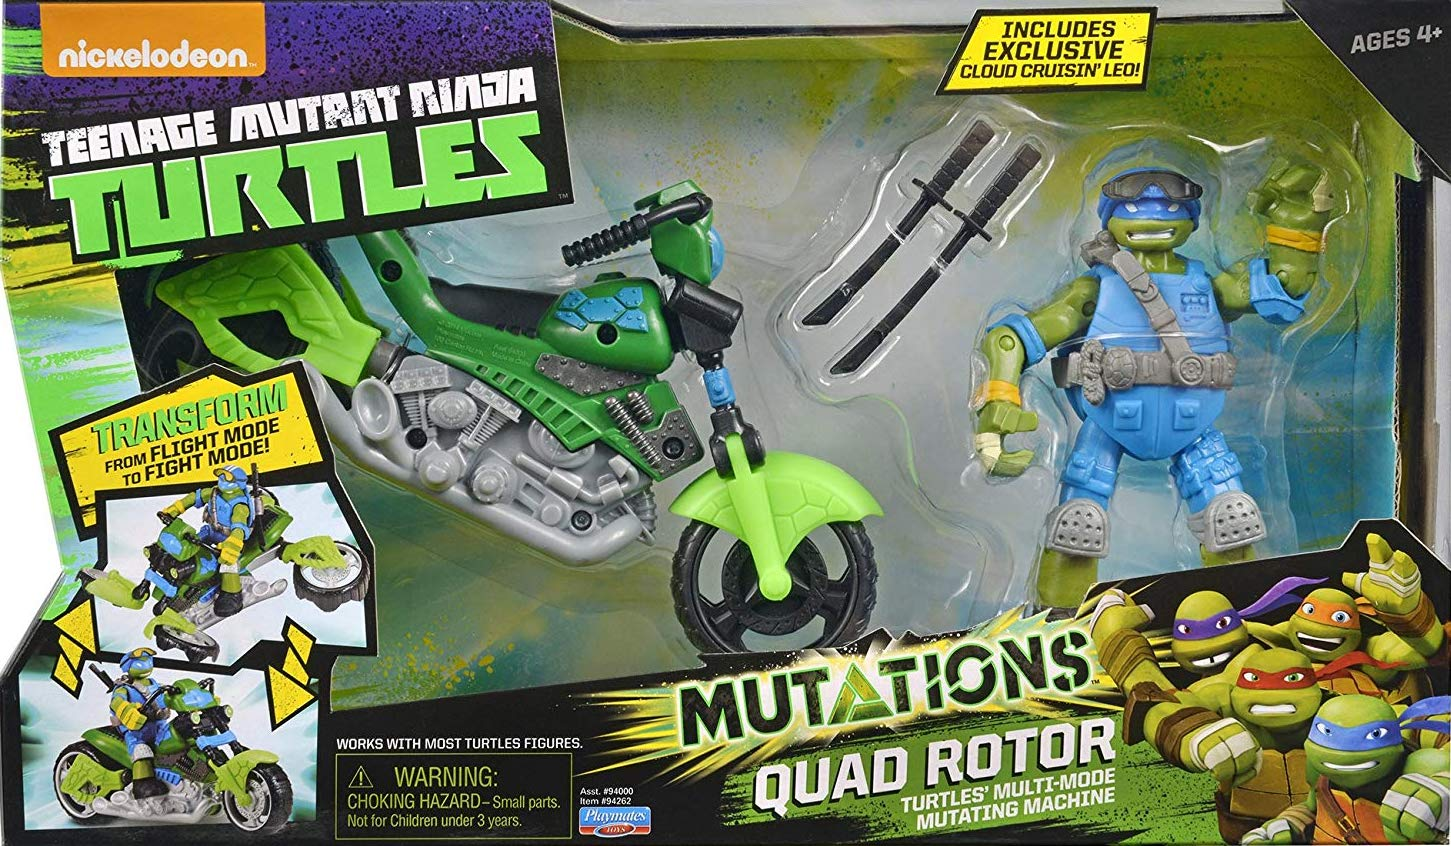 Quad Rotor (2015 toy)